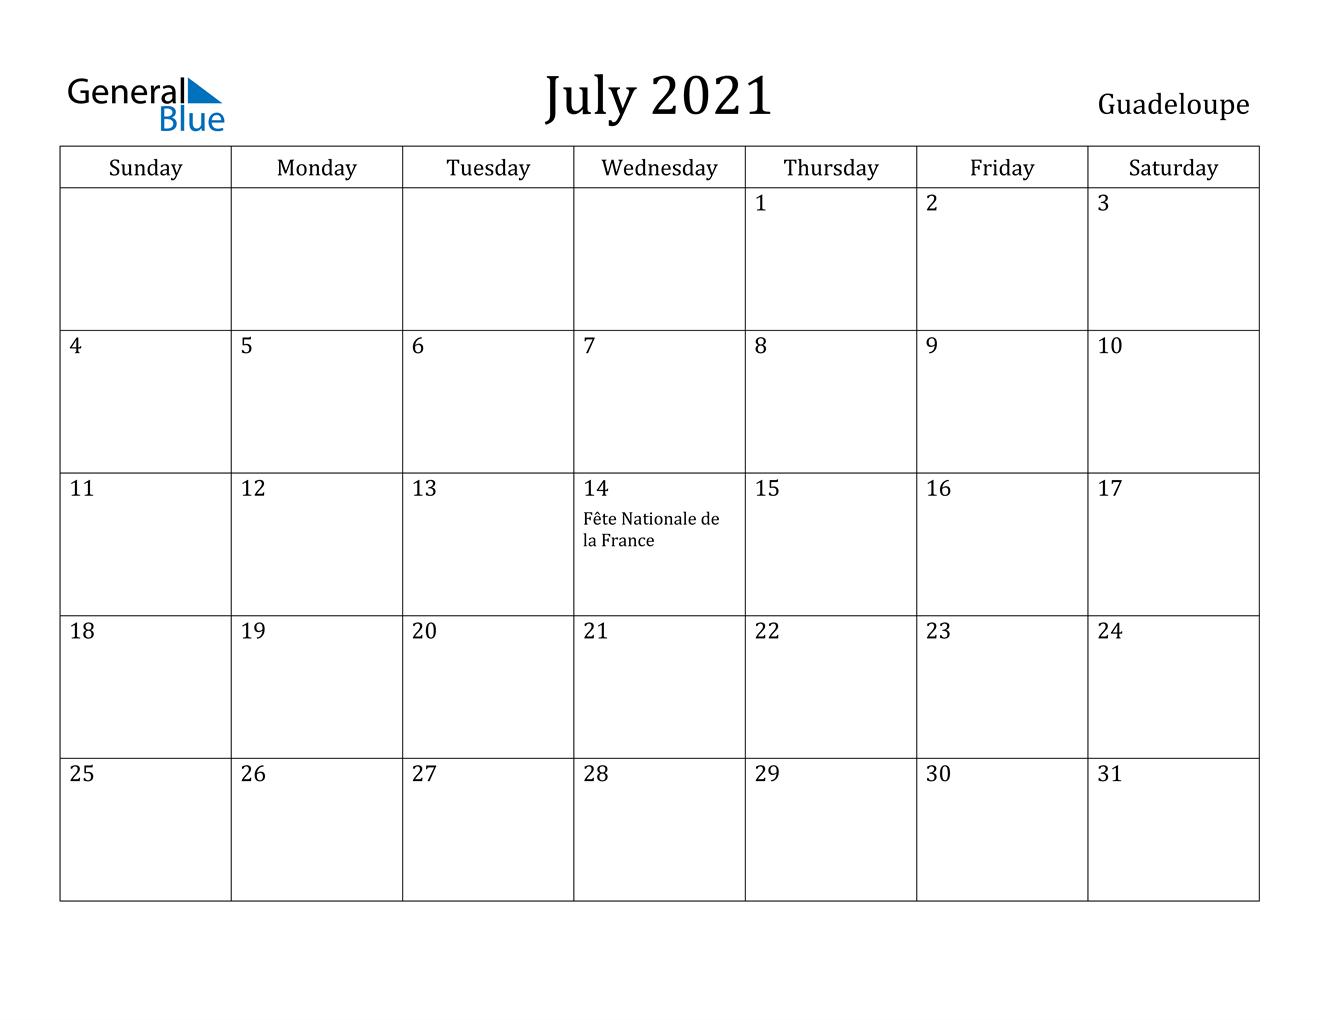 July 2021 Calendar Guadeloupe